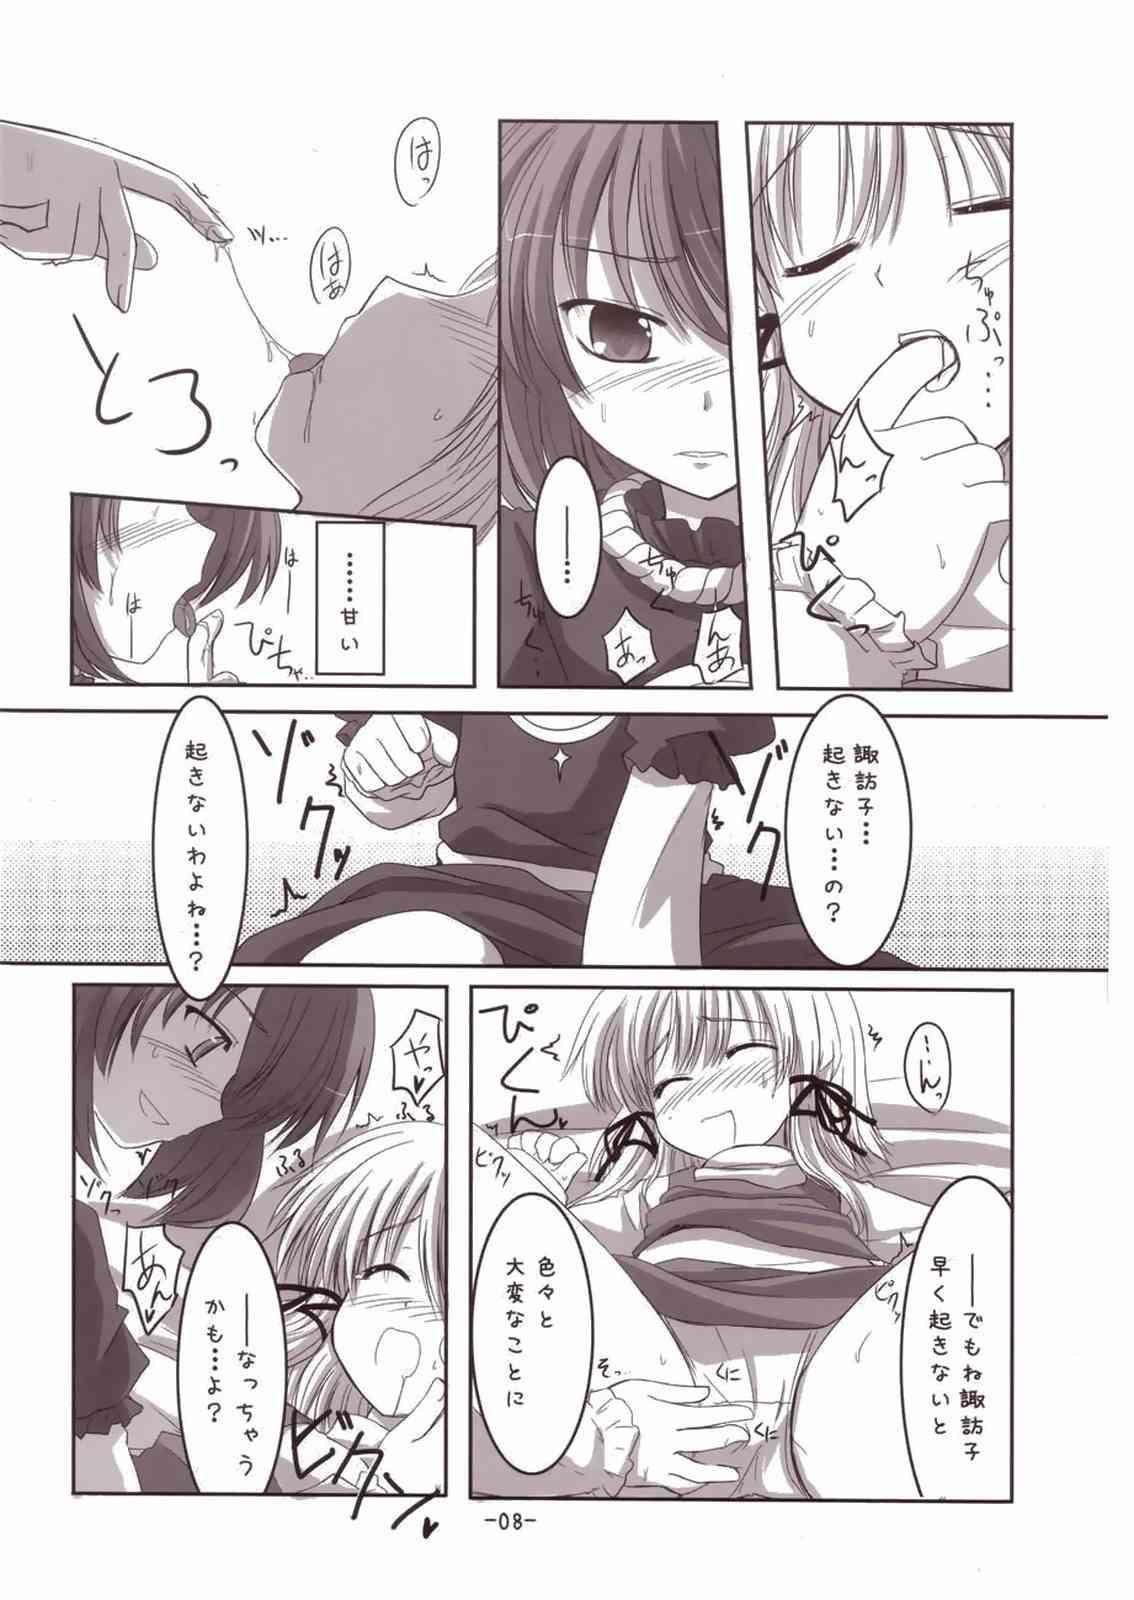 Suwako-sama to Issho! 7